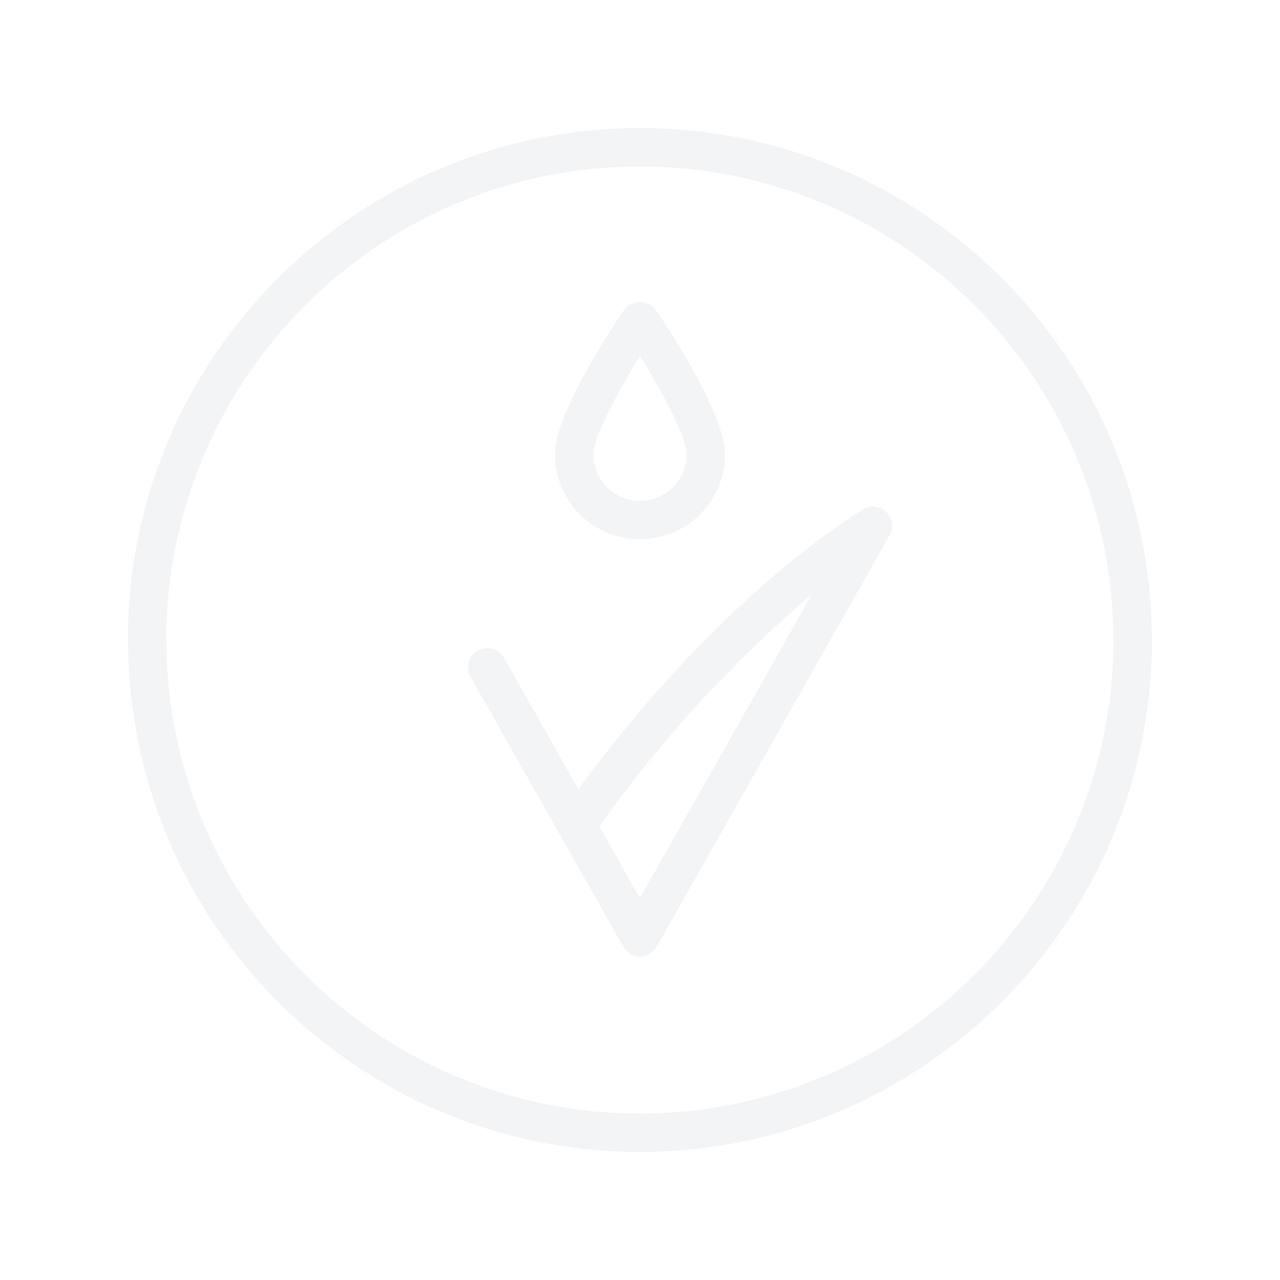 DECLEOR Prolagene Lift & Firm Rich Day Cream 50ml